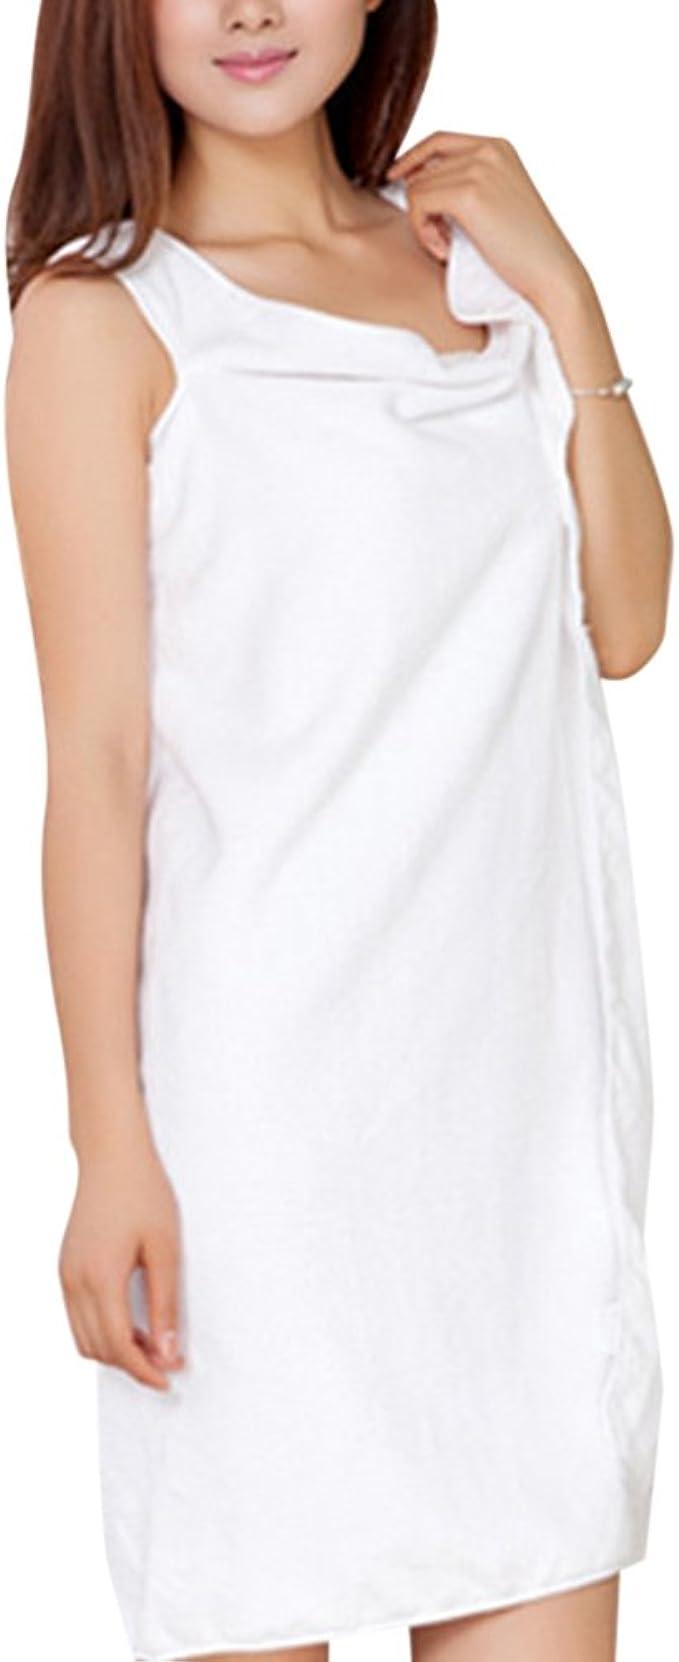 ZiXing Pour femme Wearable Super Doux Eau absorbant en microfibre Sweet Bowknot Serviette de bain Spa Robe tube